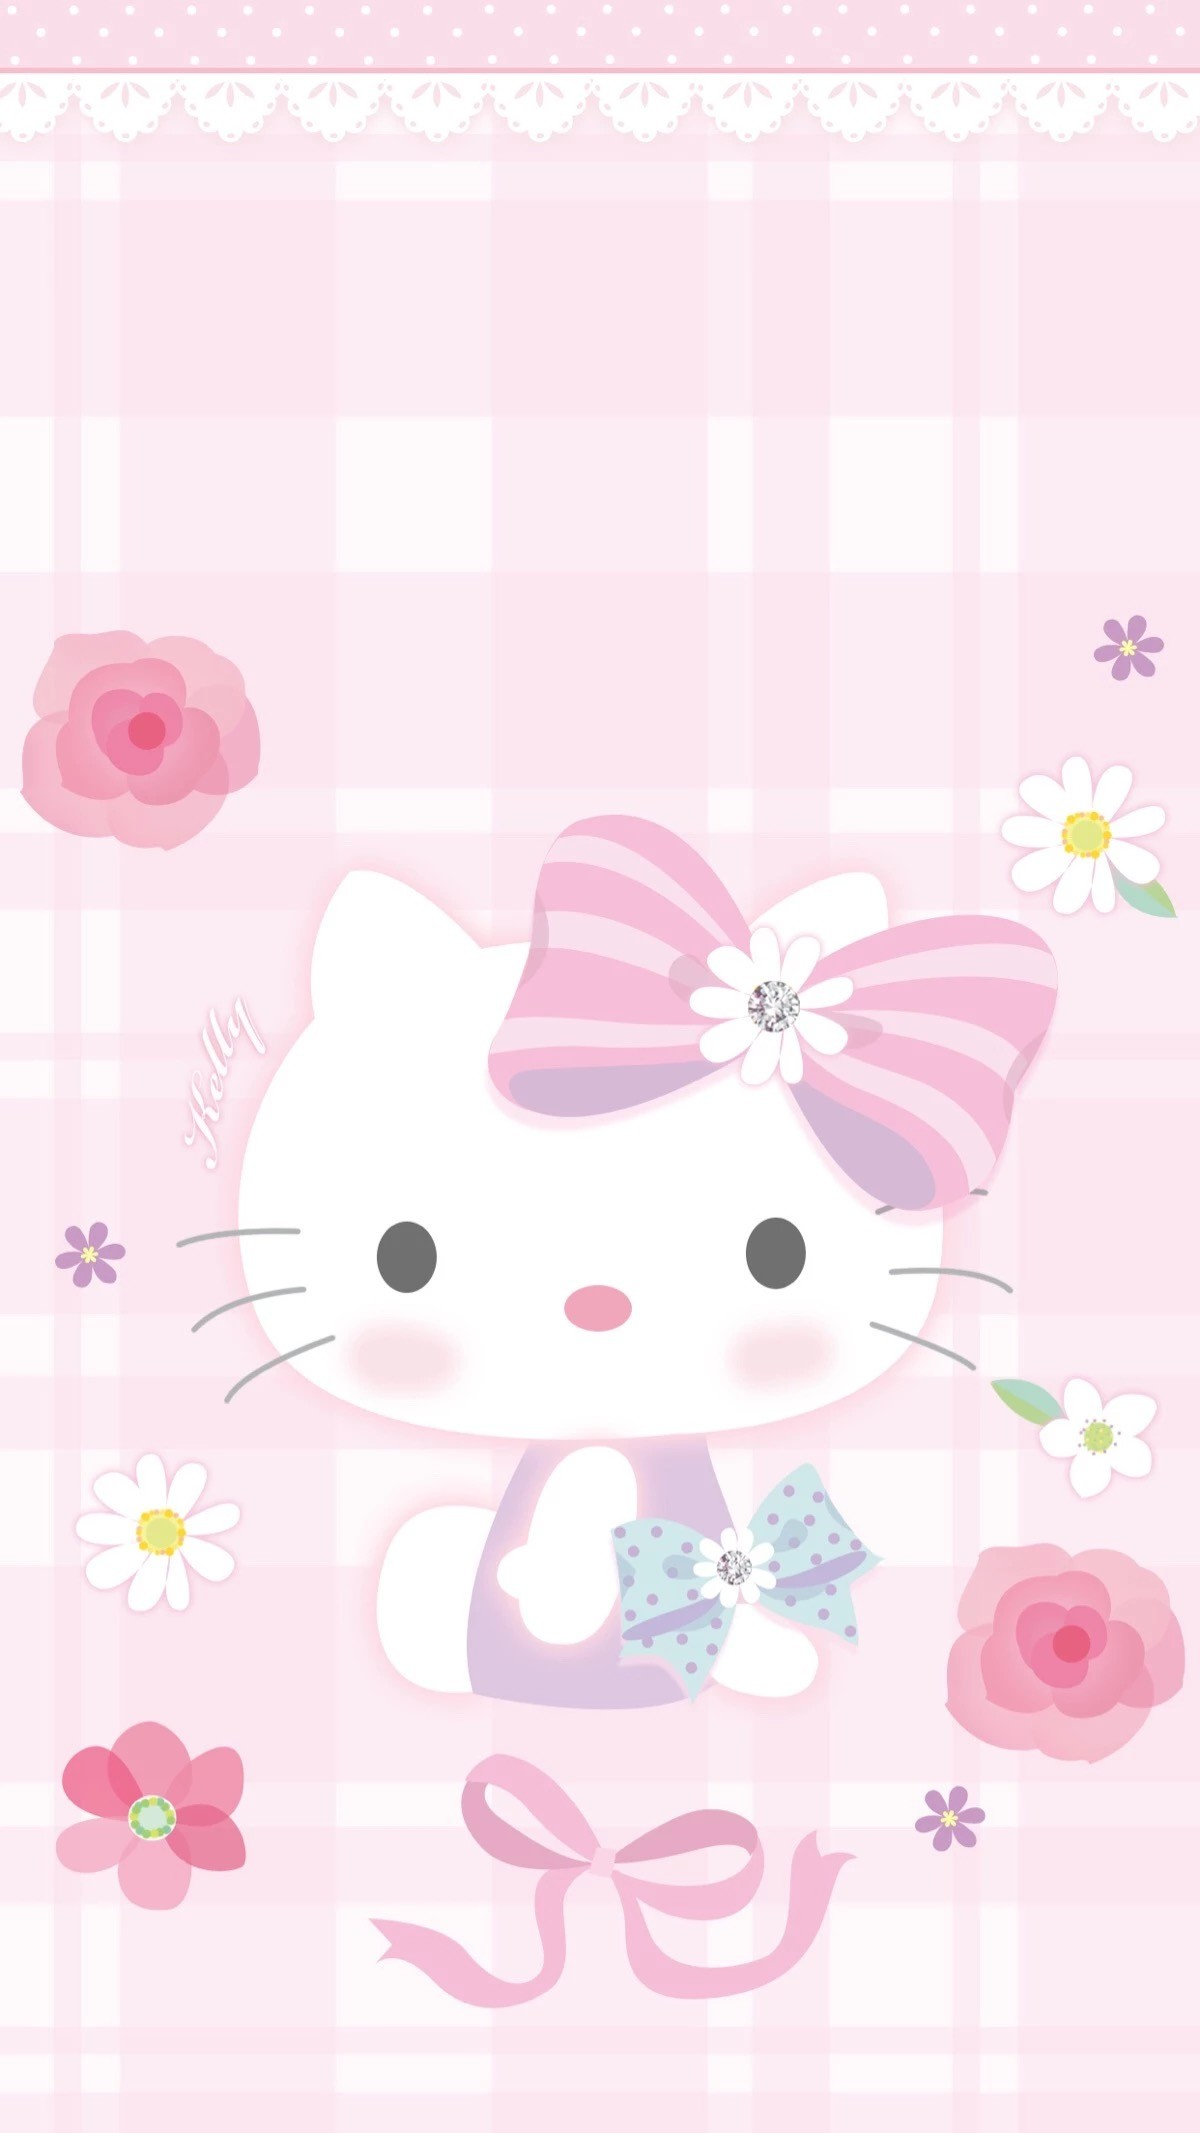 Amazing Wallpaper Hello Kitty Iphone 5 - 856403-hello-kitty-winter-wallpaper-1200x2133-for-iphone  Photograph_213287.jpg